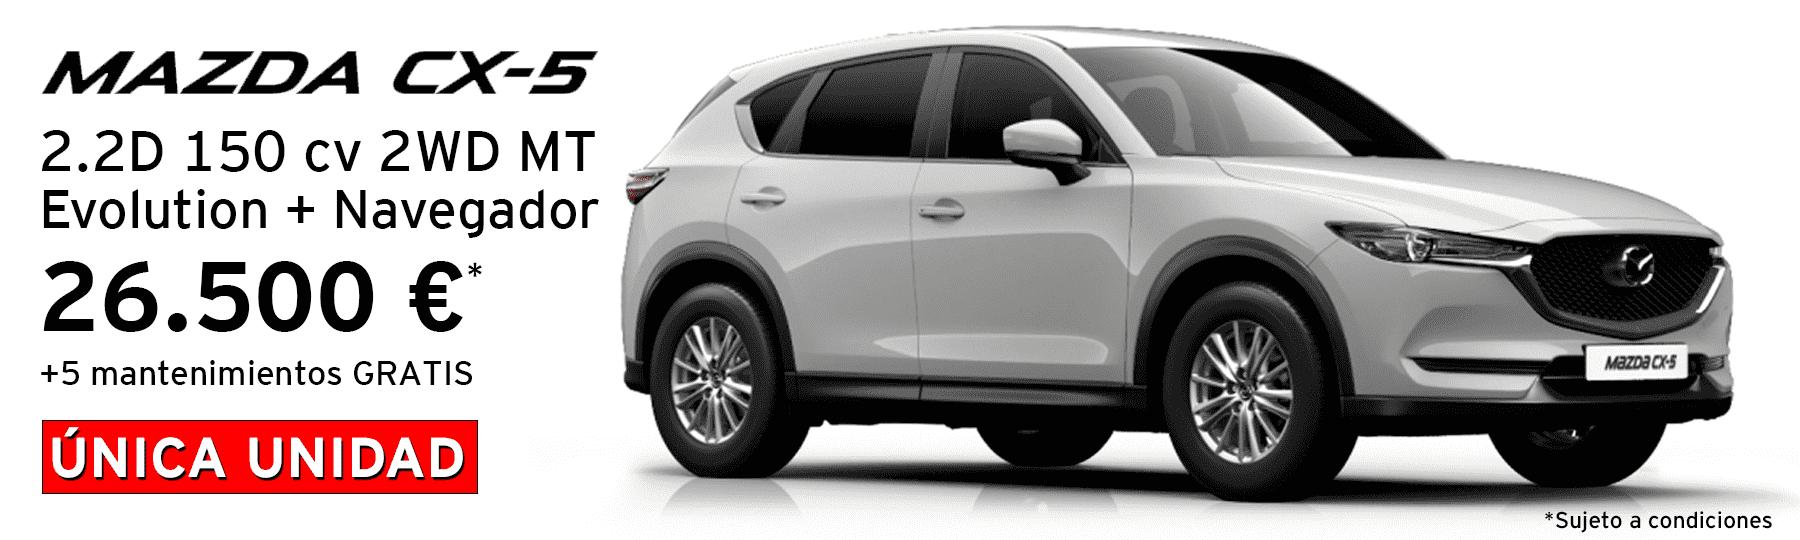 Nuevo Mazda CX5 2.2d 150 cv 2WD MT Evolution + Navegador